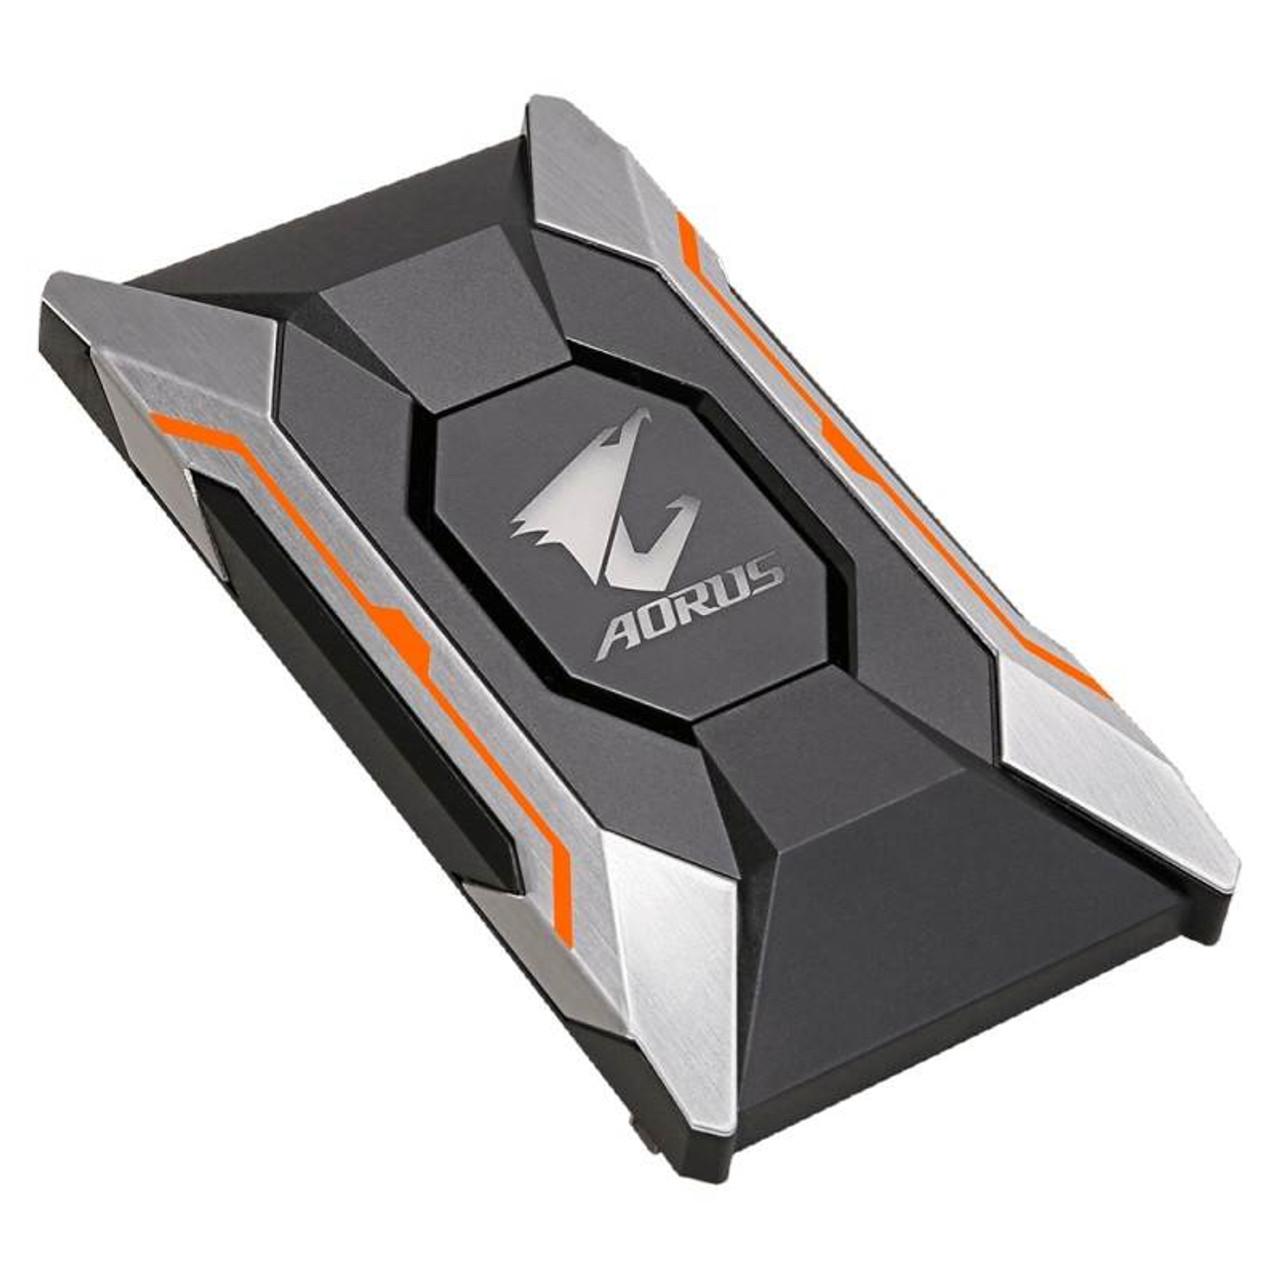 Gigabyte AORUS RGB SLI HB Bridge - 2 Slot Spacing